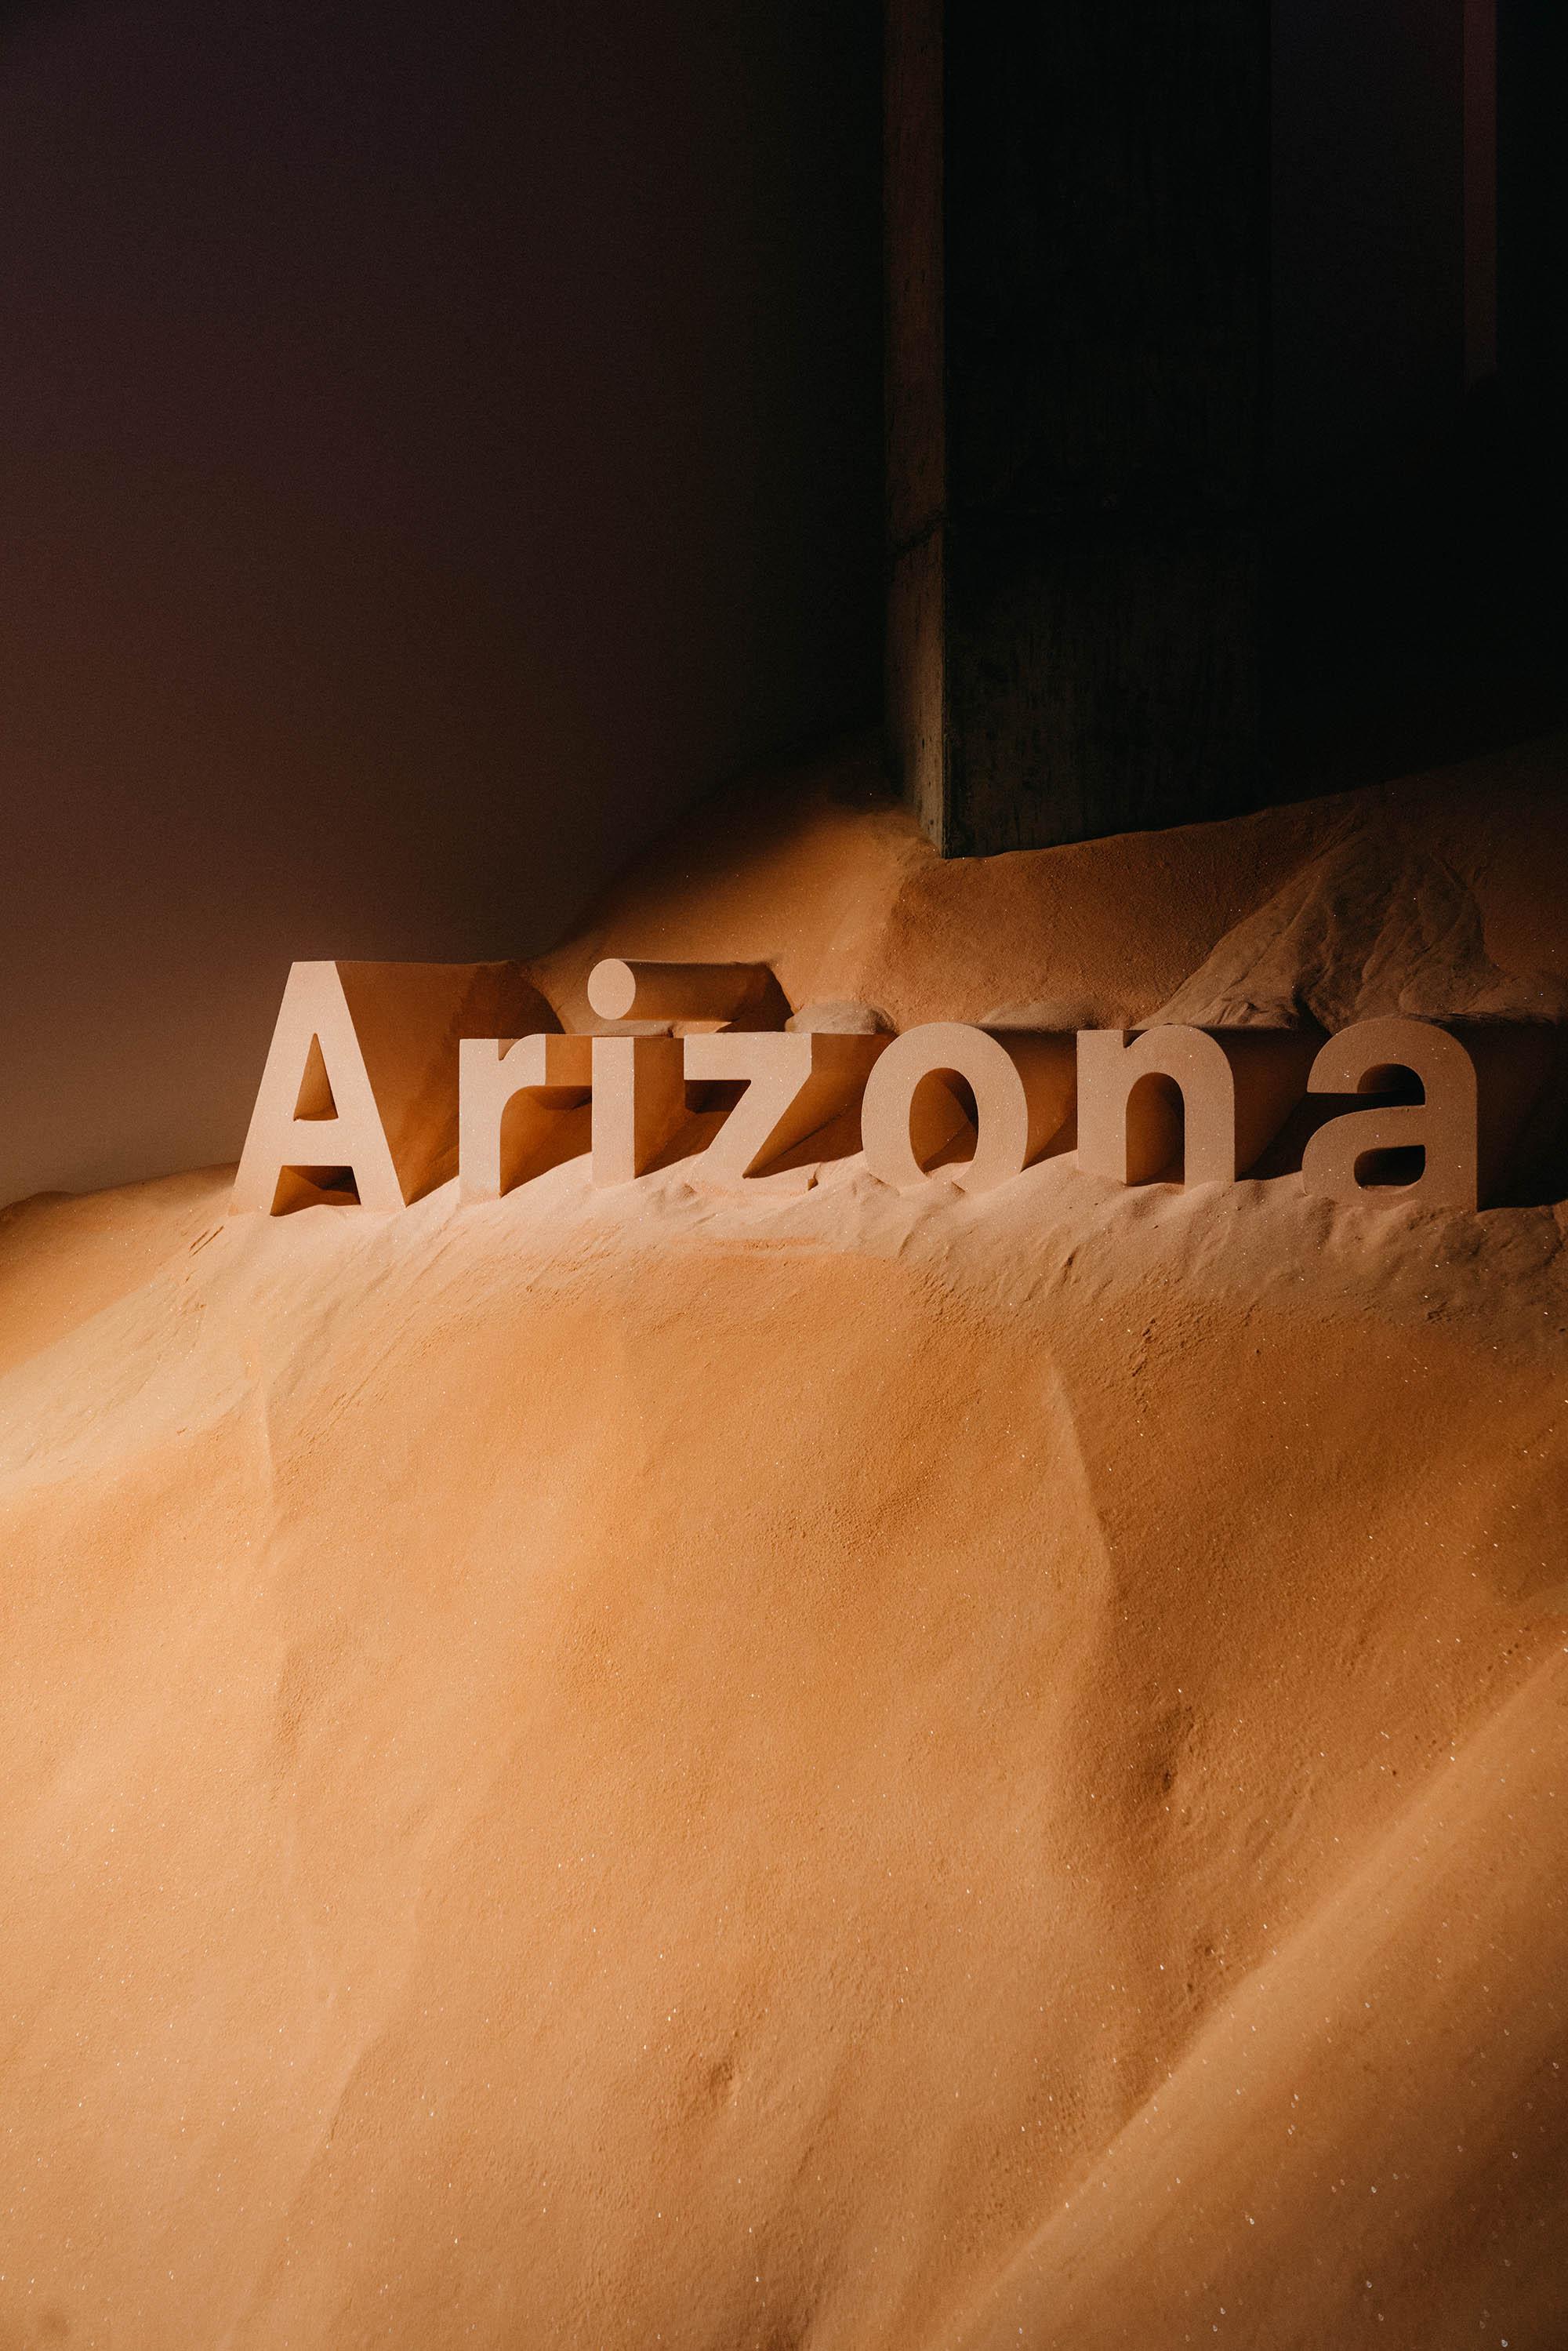 Proenza Schouler 'Arizona' Fragrance  Launch Event